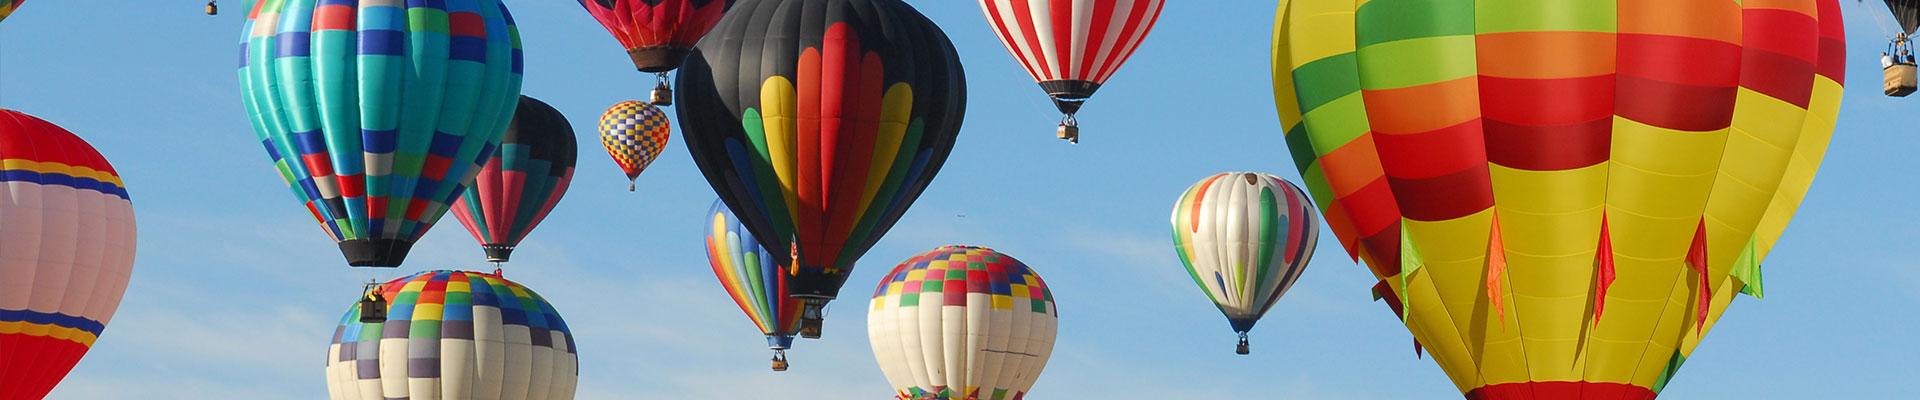 Fantasy RV Tours: 5 Day Balloon Fiesta for Good Sam (05UBFG-100721)